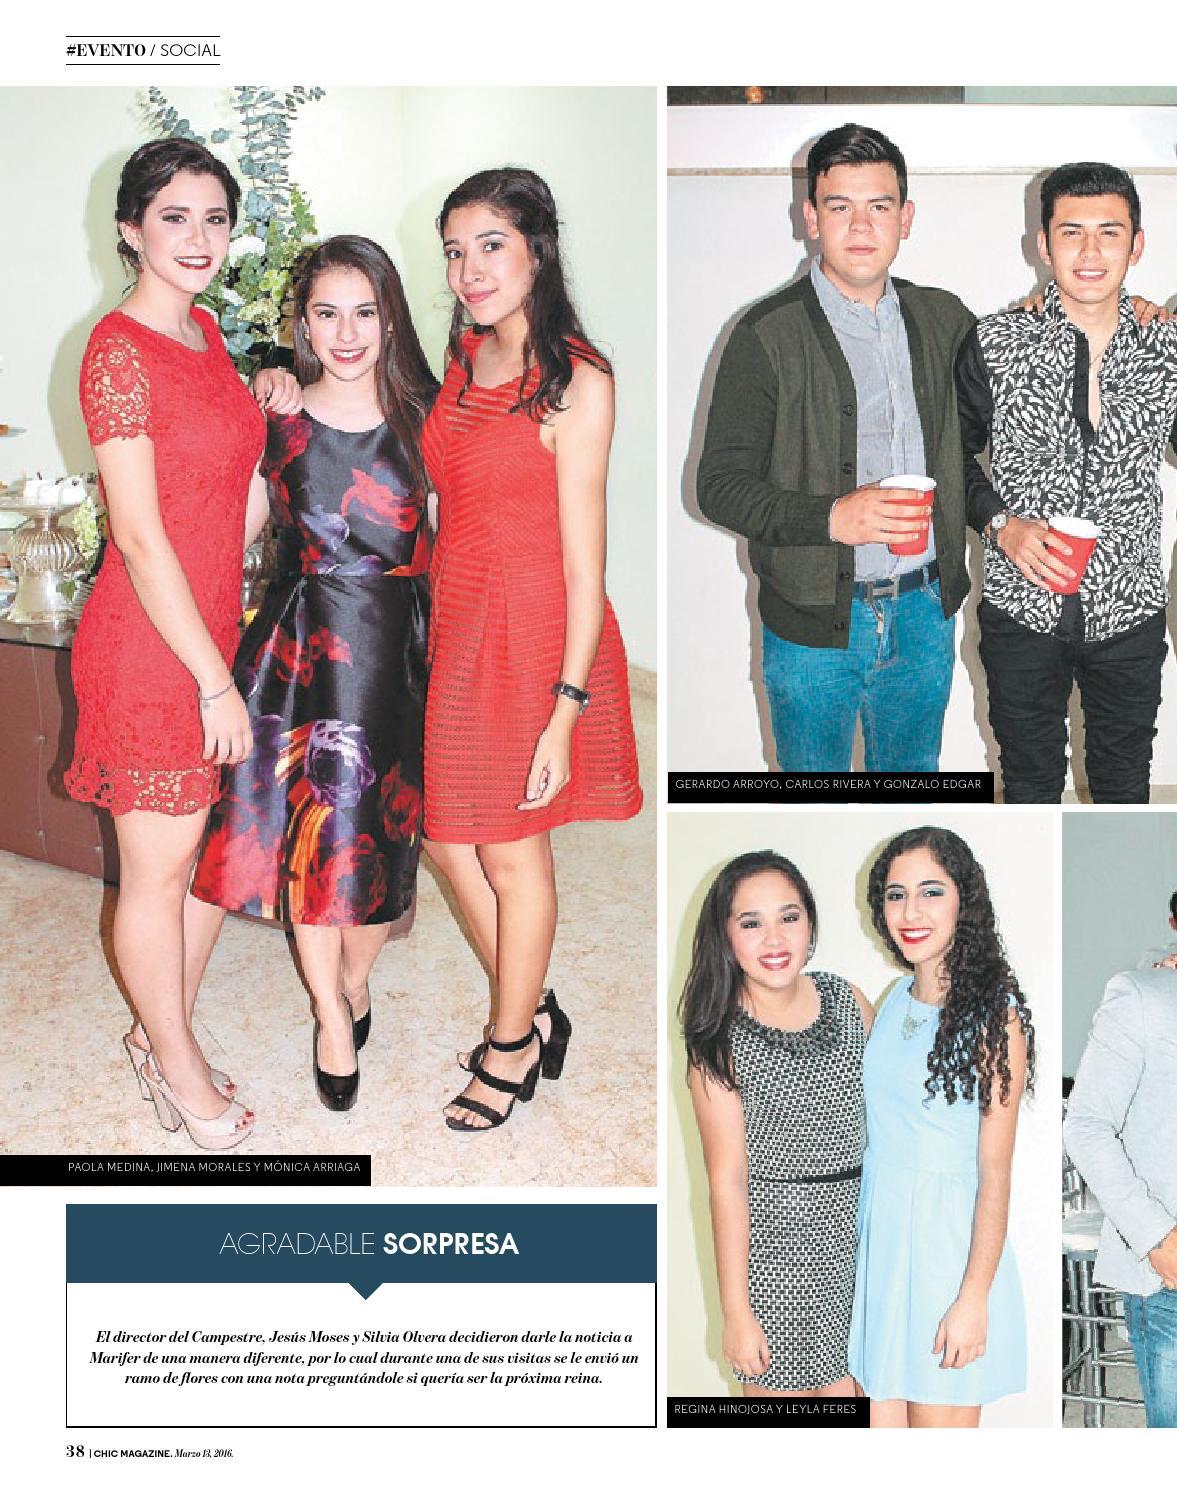 Imagenes De Silvia Olvera chic magazine tamaulipas, núm. 393, 13/mar/2016chic